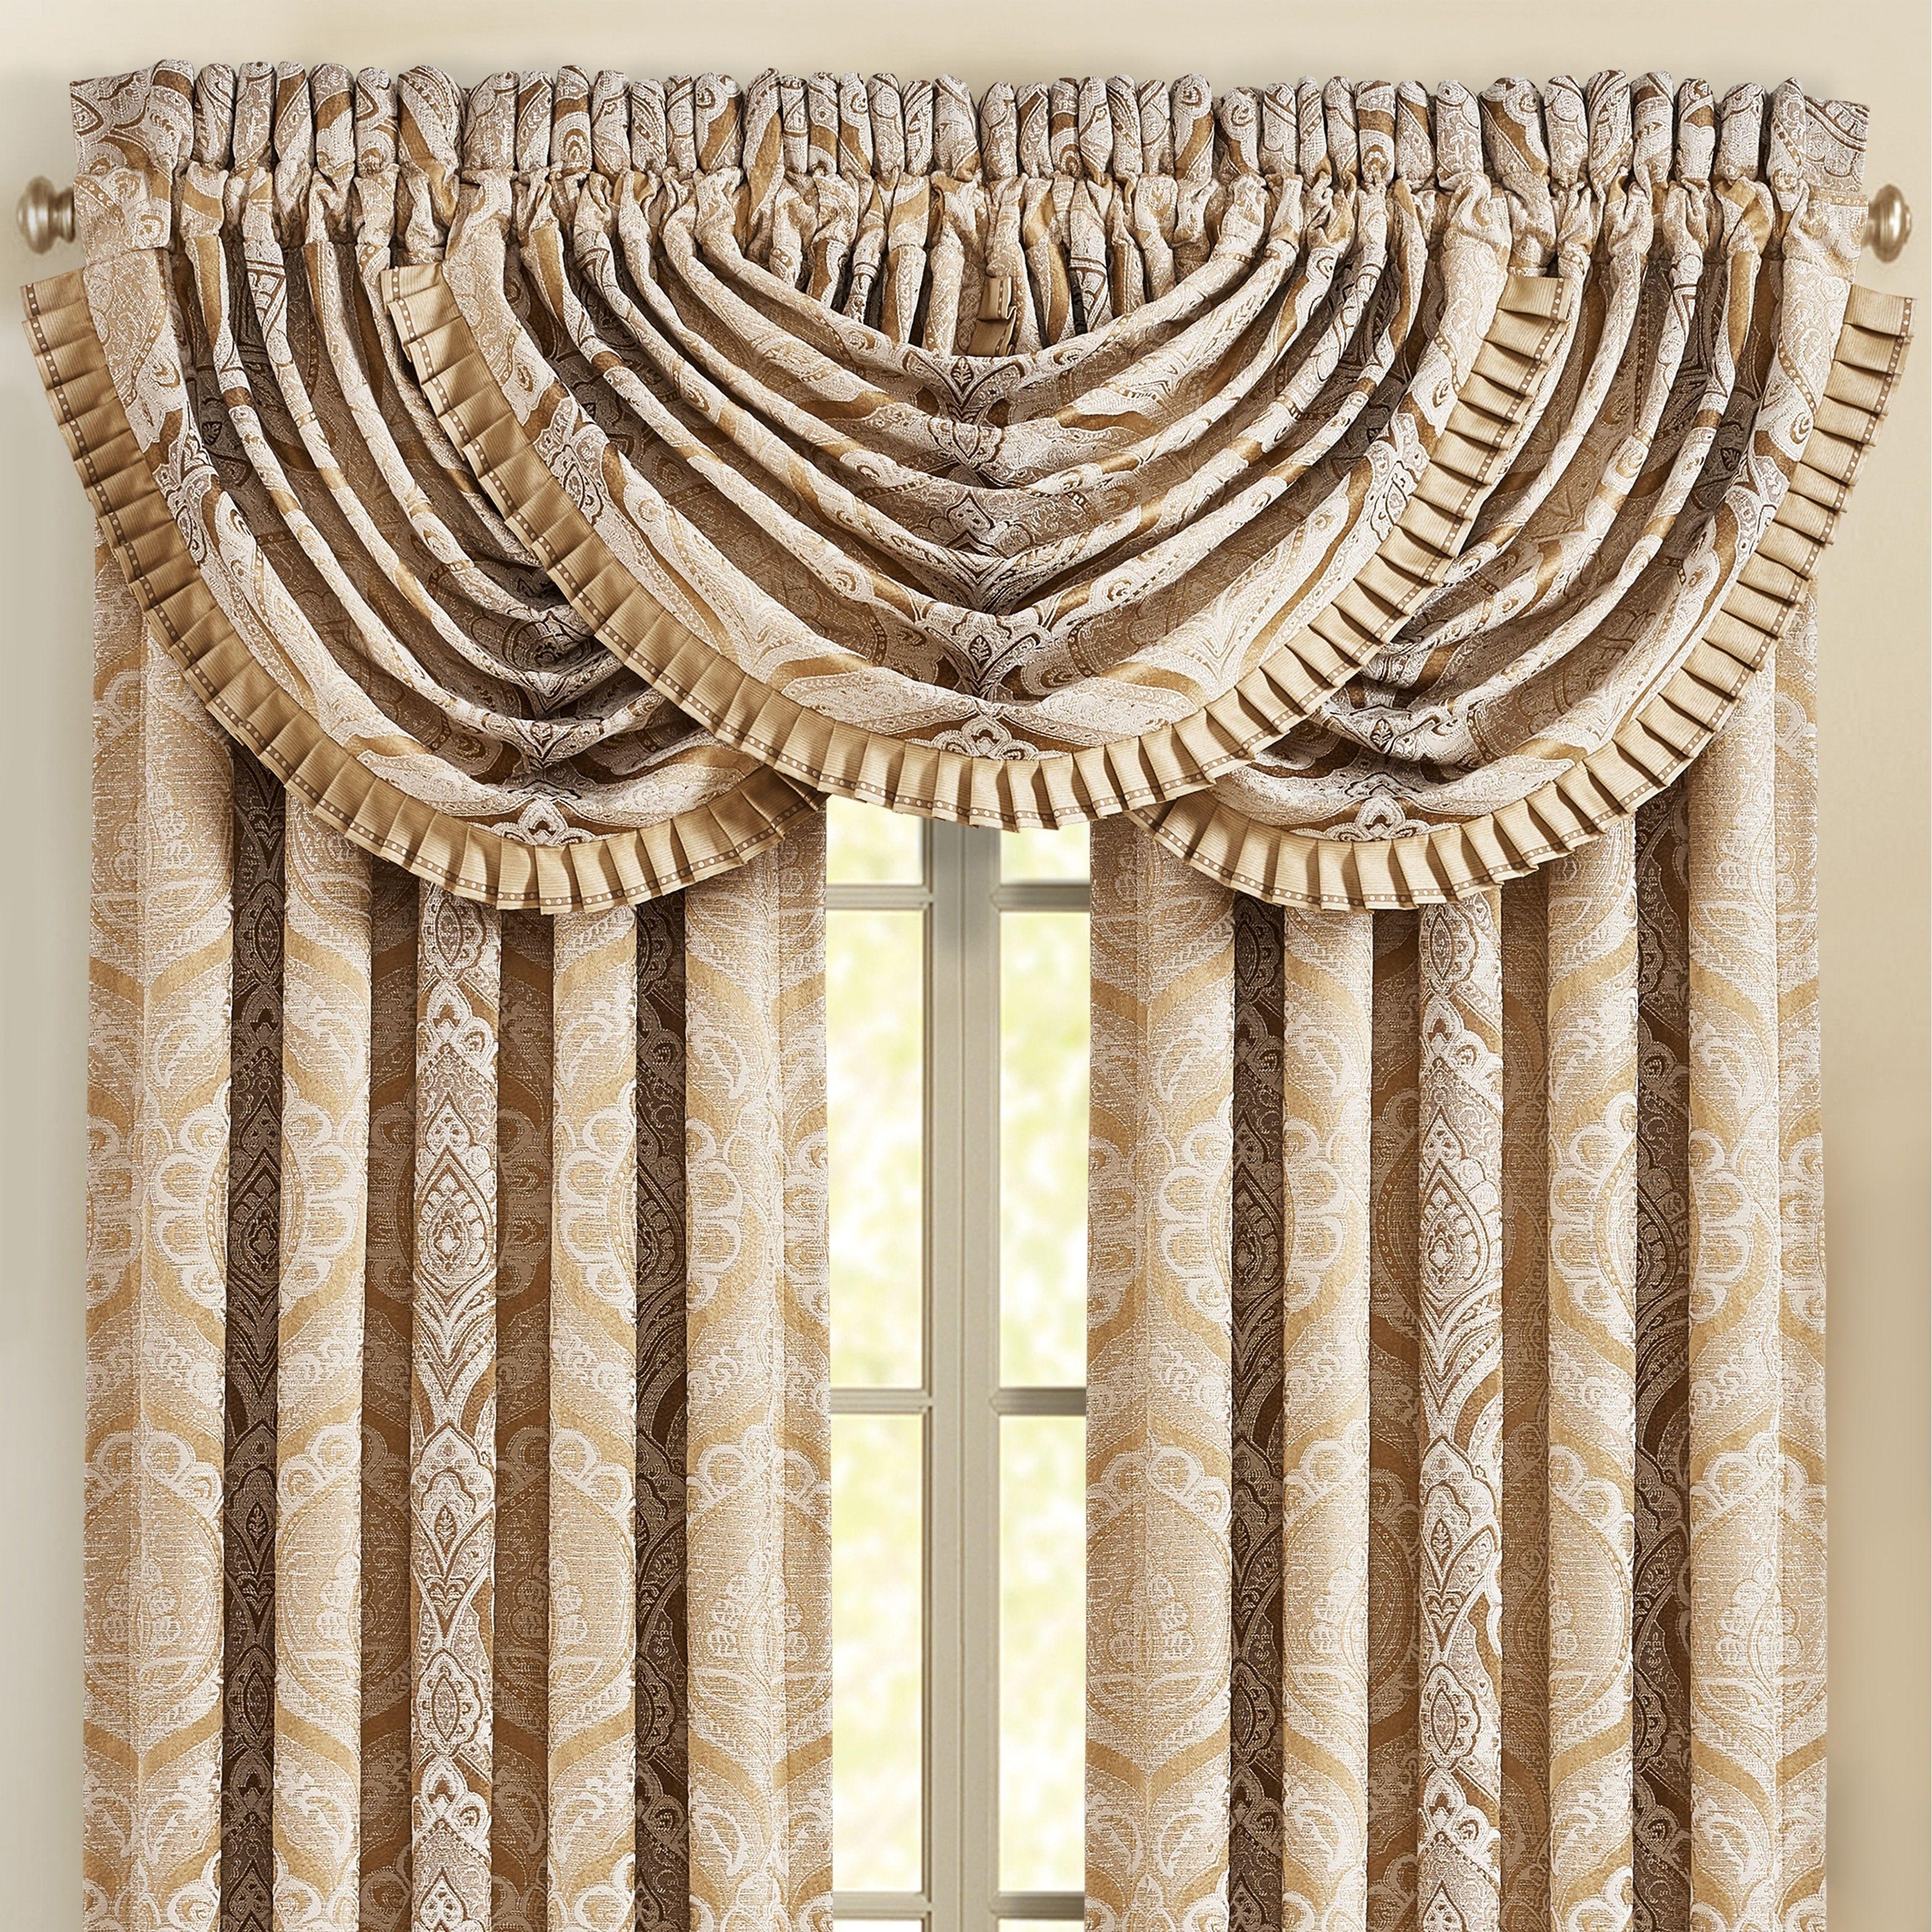 Five Queens Court Giodana Window Waterfall Valance Gold 100 Polyester Damask Waterfall Valance Custom Drapes Gold Window Treatments